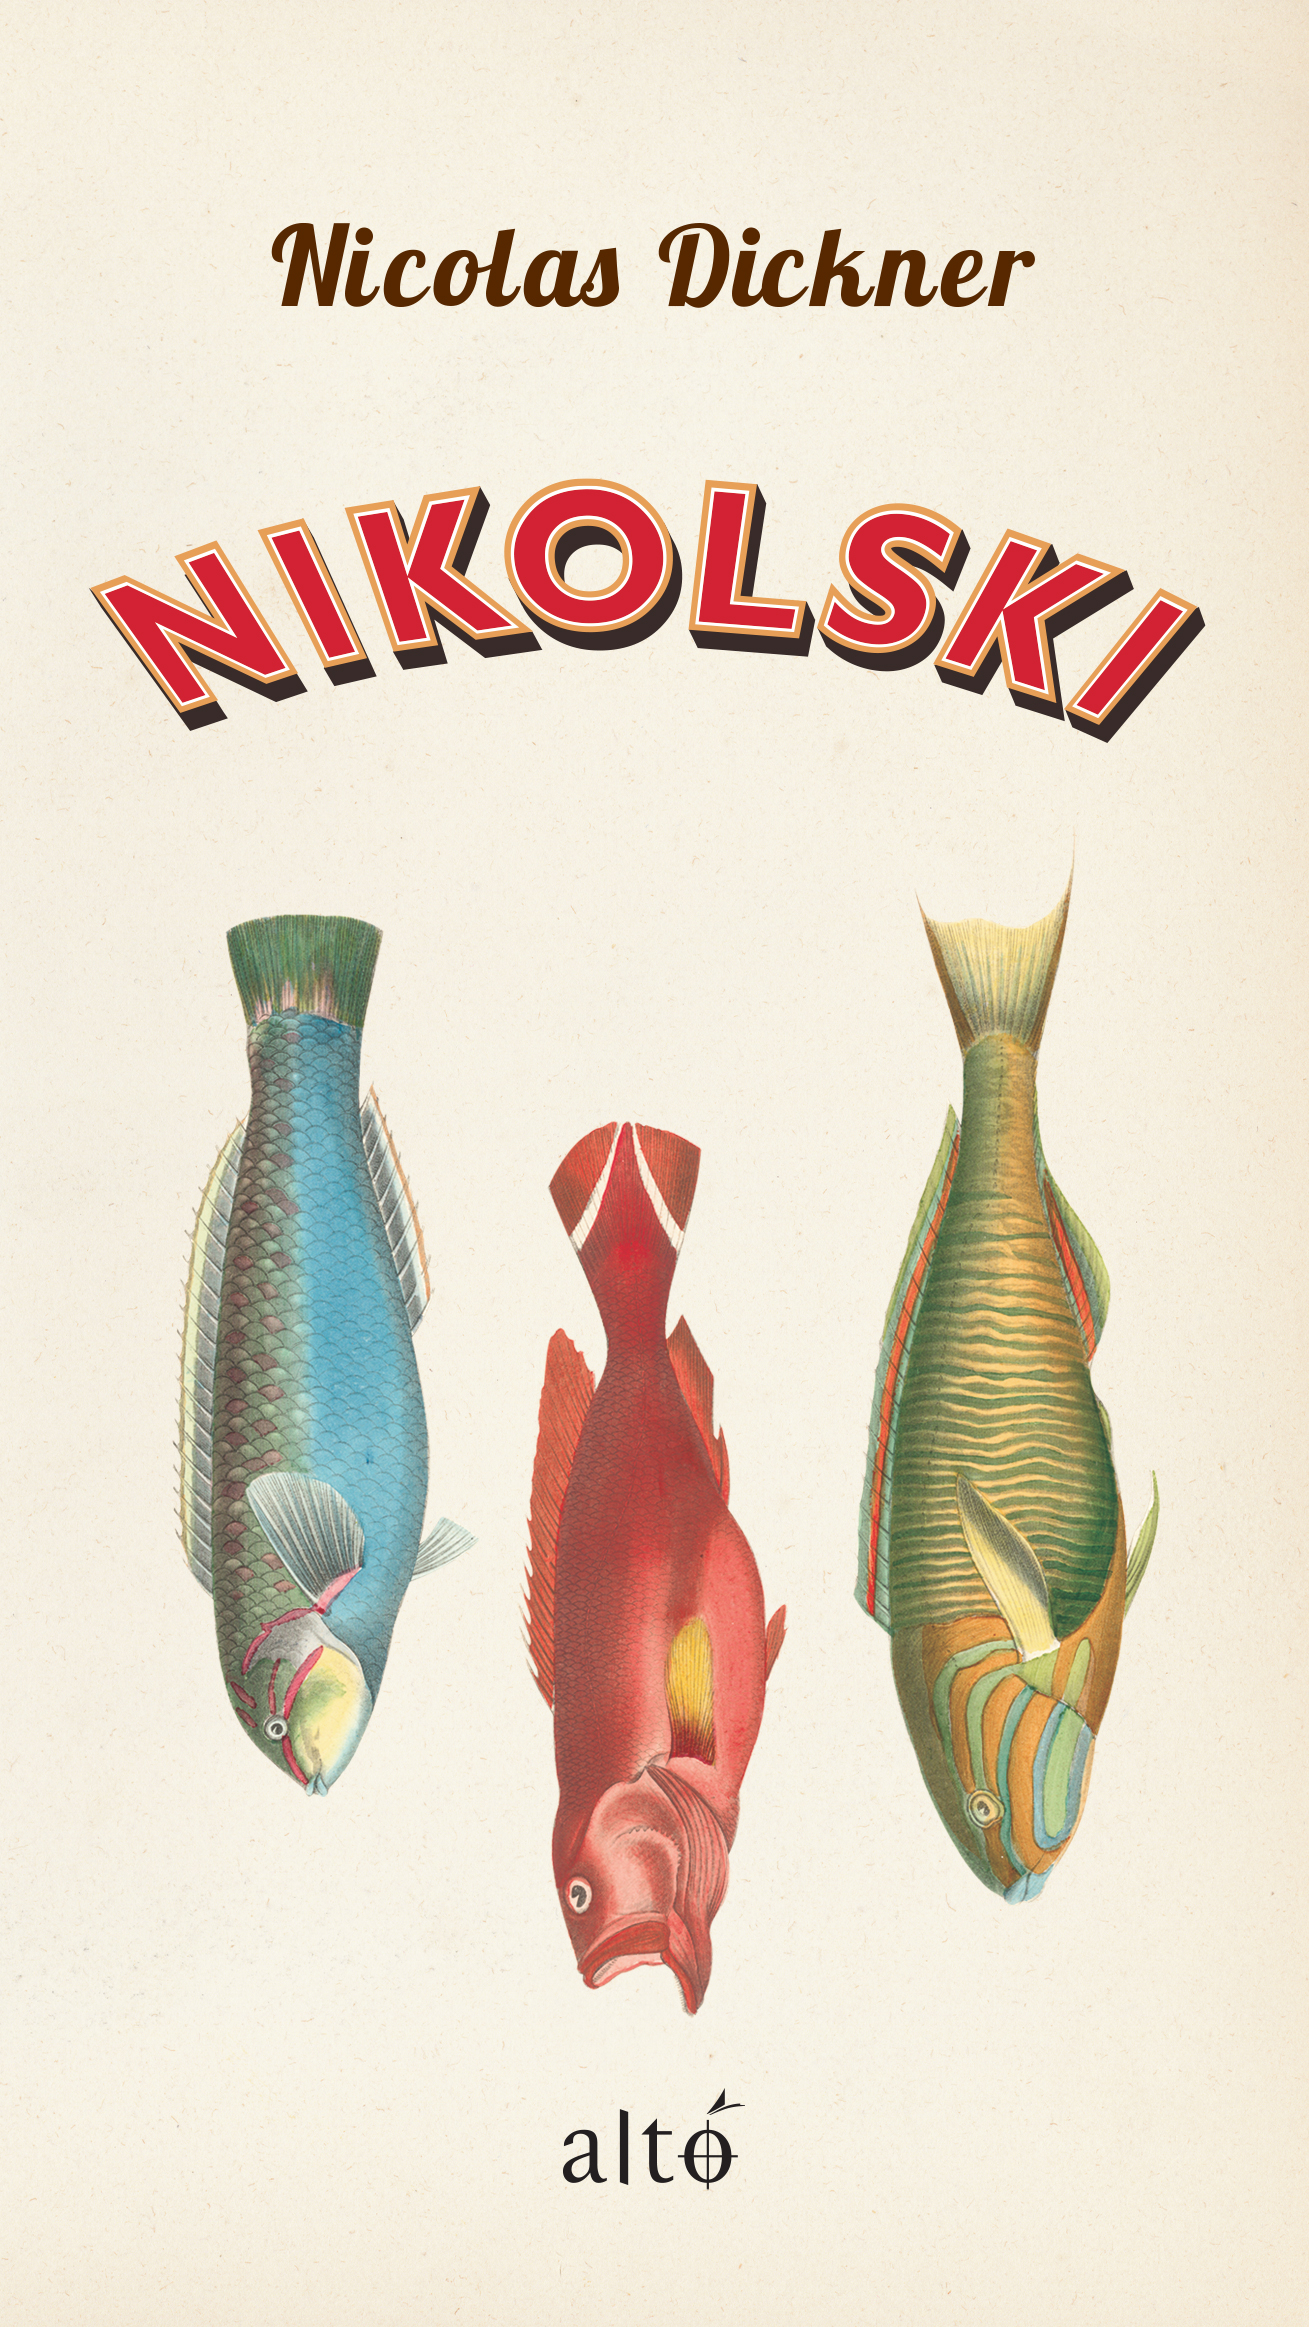 Couverture : Nikolski Nicolas Dickner